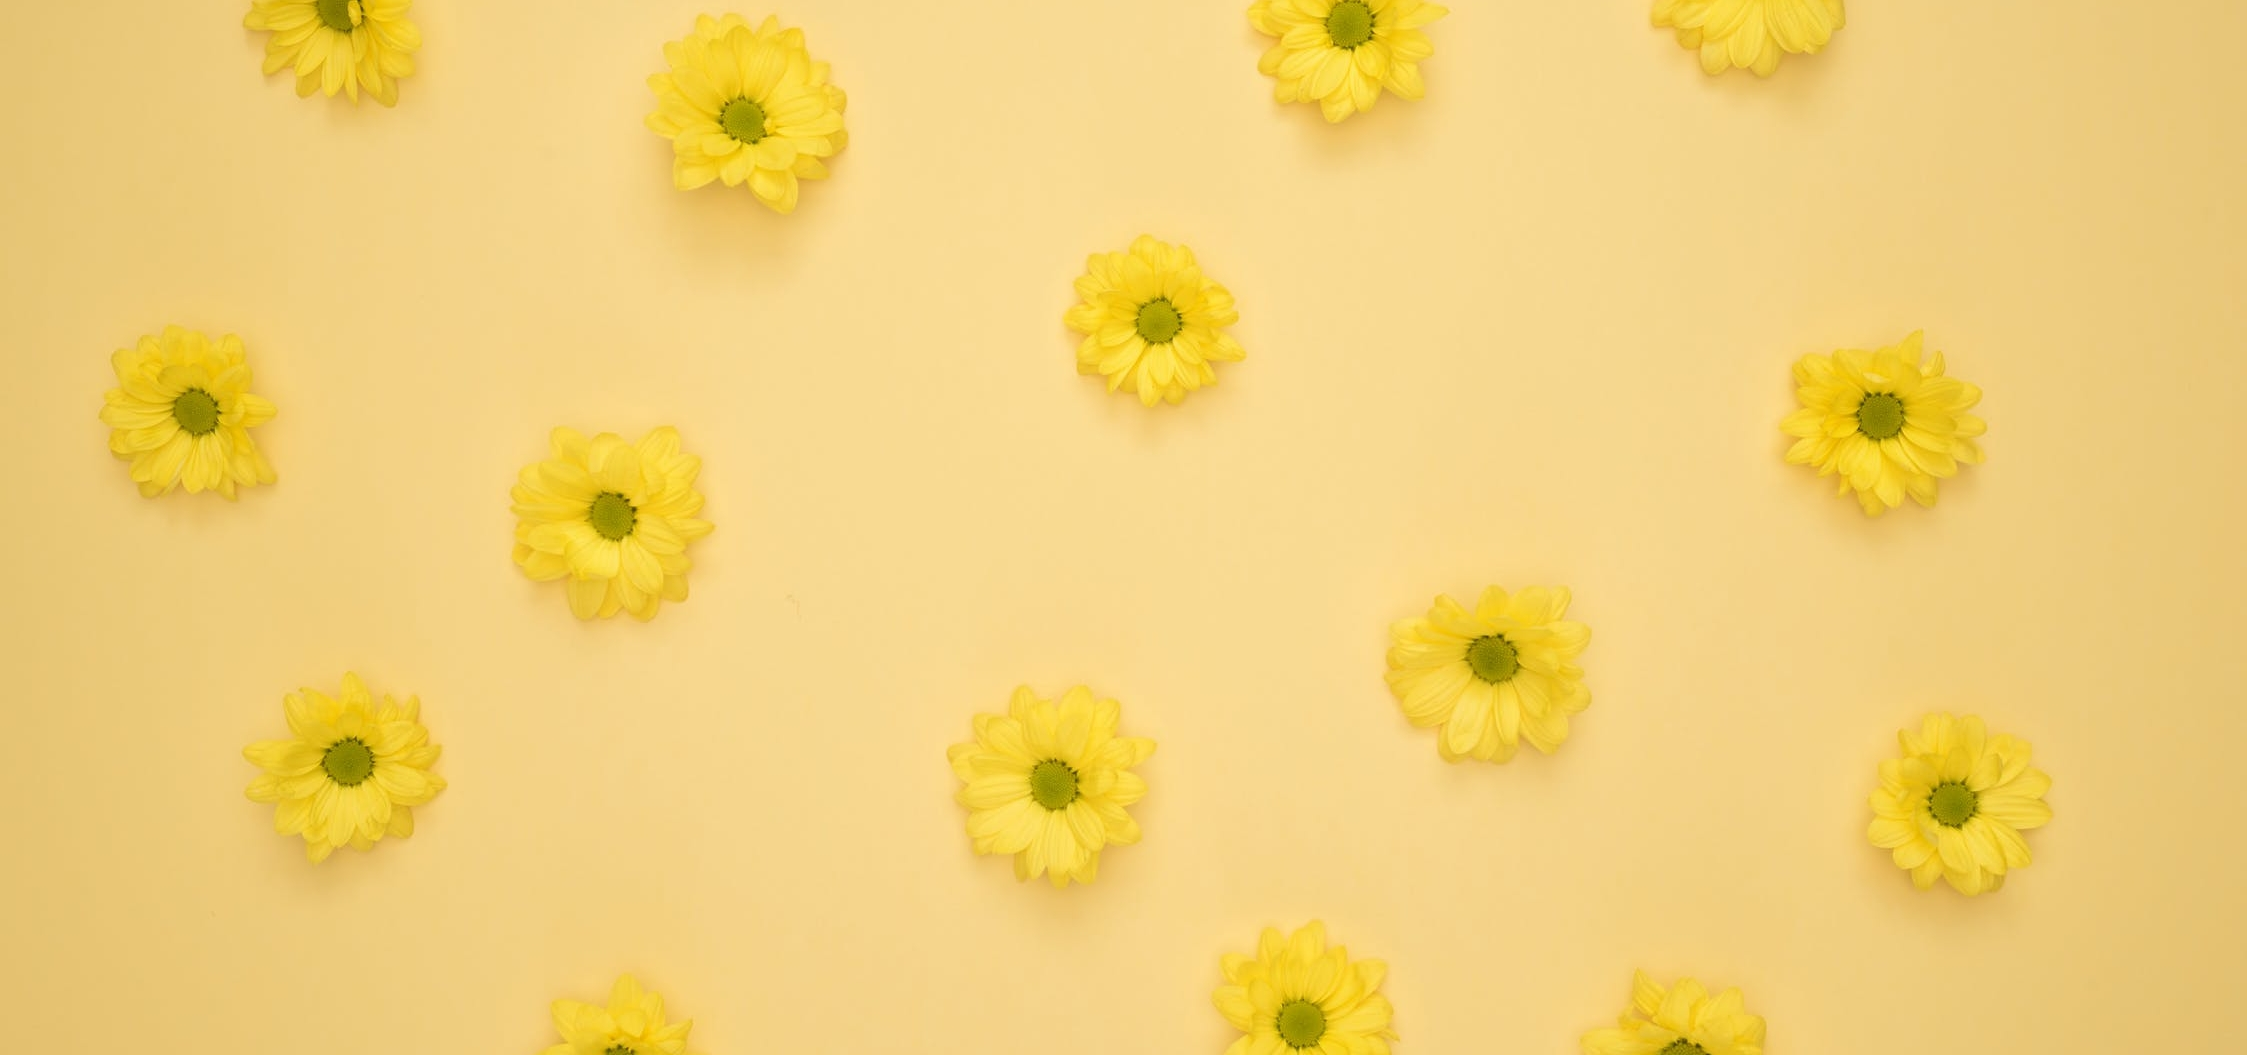 pexels-photo-1037998.jpeg